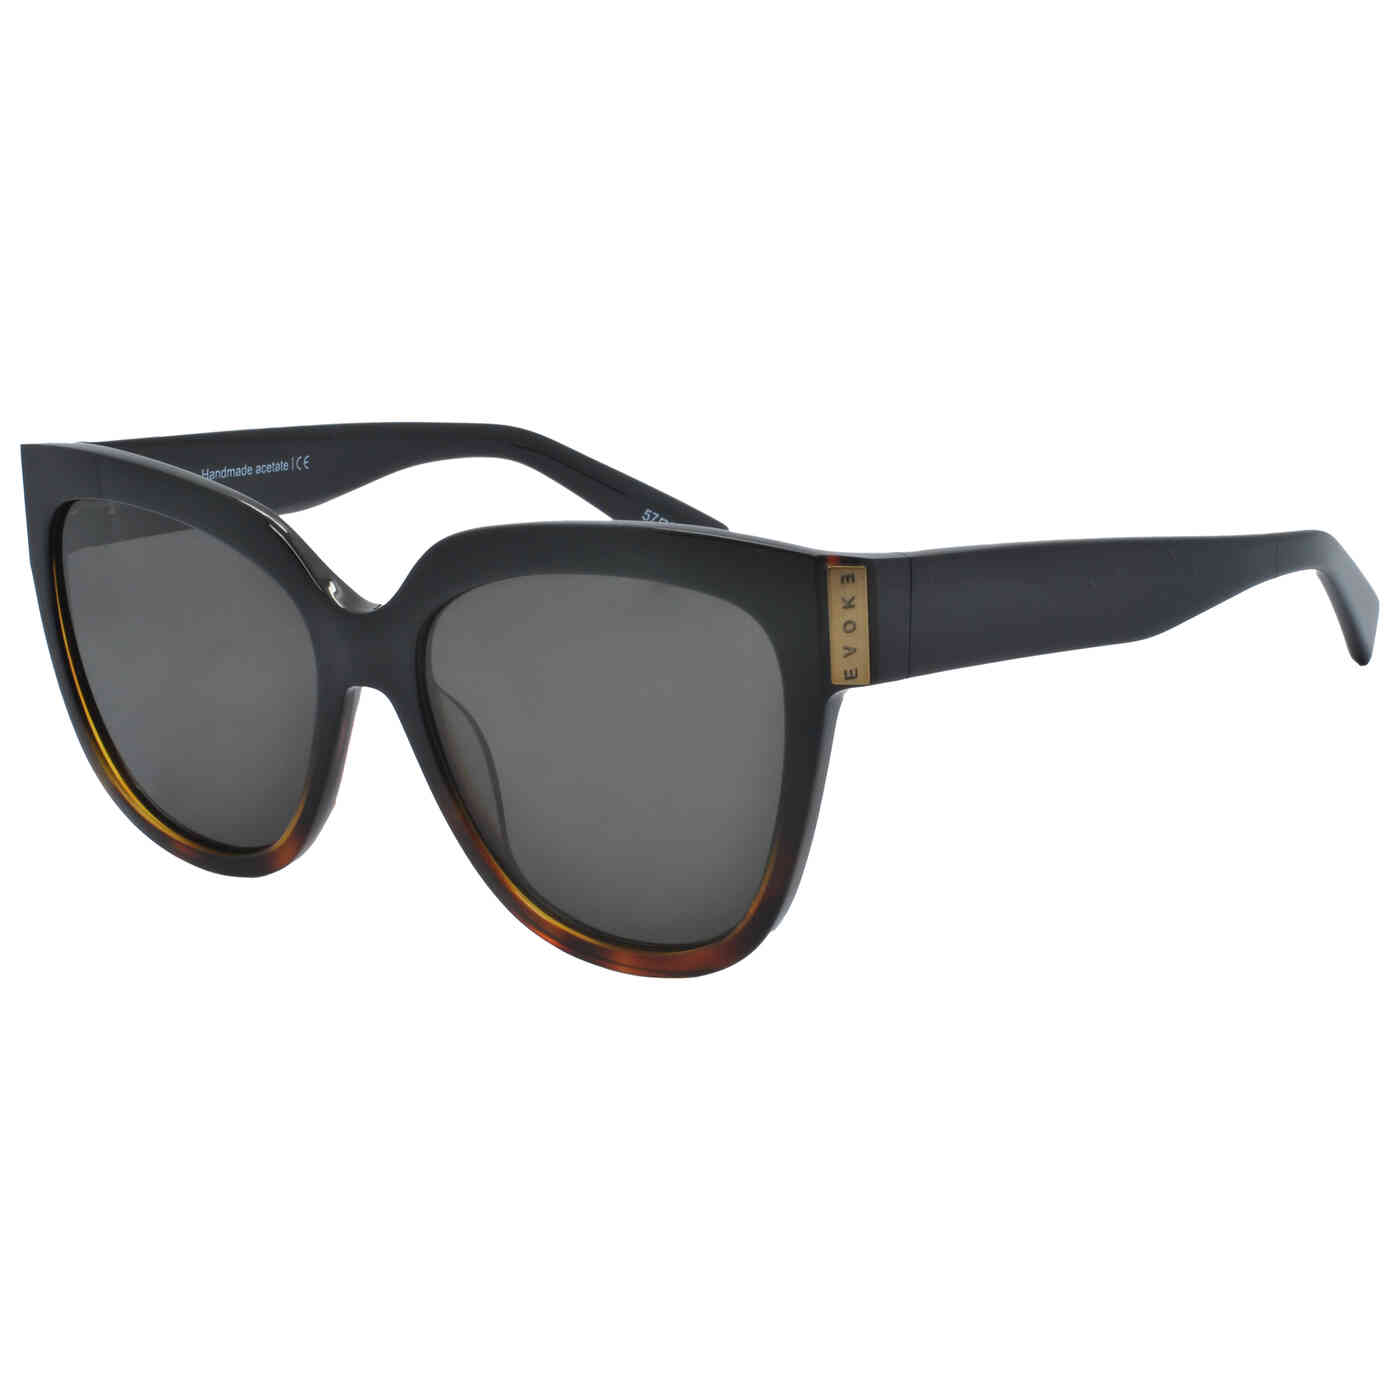 Óculos de Sol Evoke Reveal 3 Polarizado Feminino